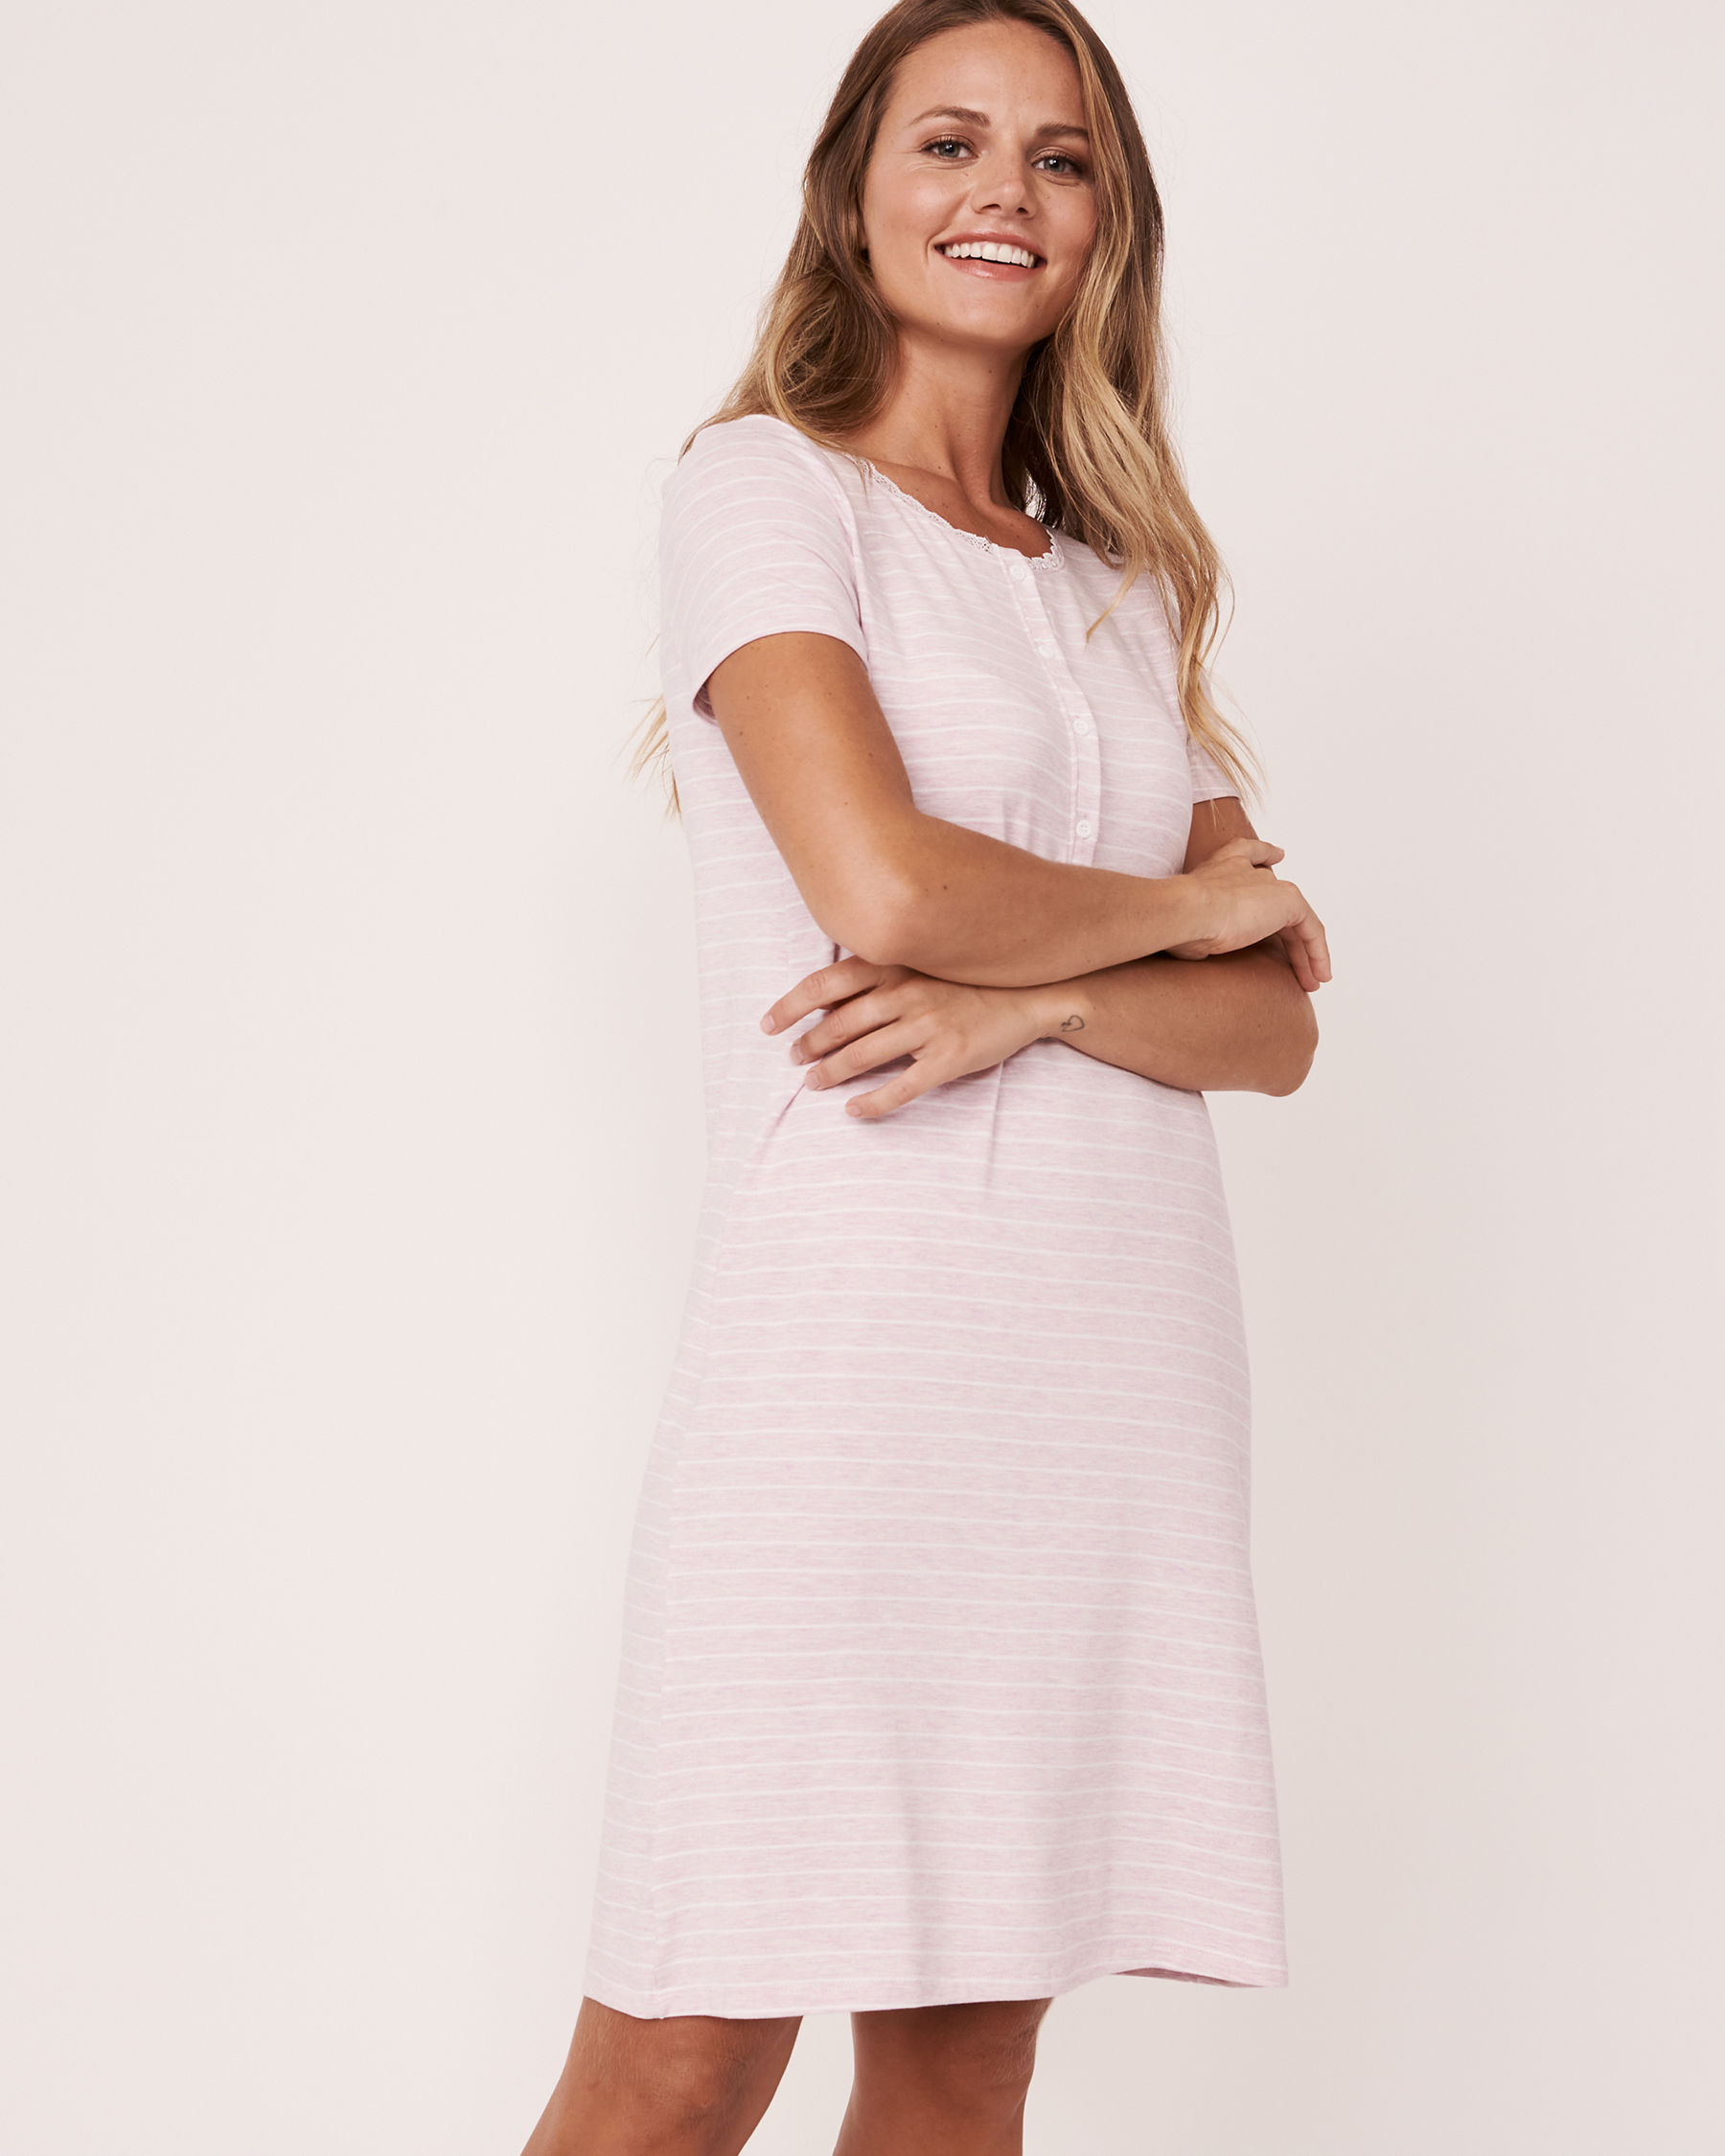 LA VIE EN ROSE Henley Sleepshirt Stripes 50400004 - View1